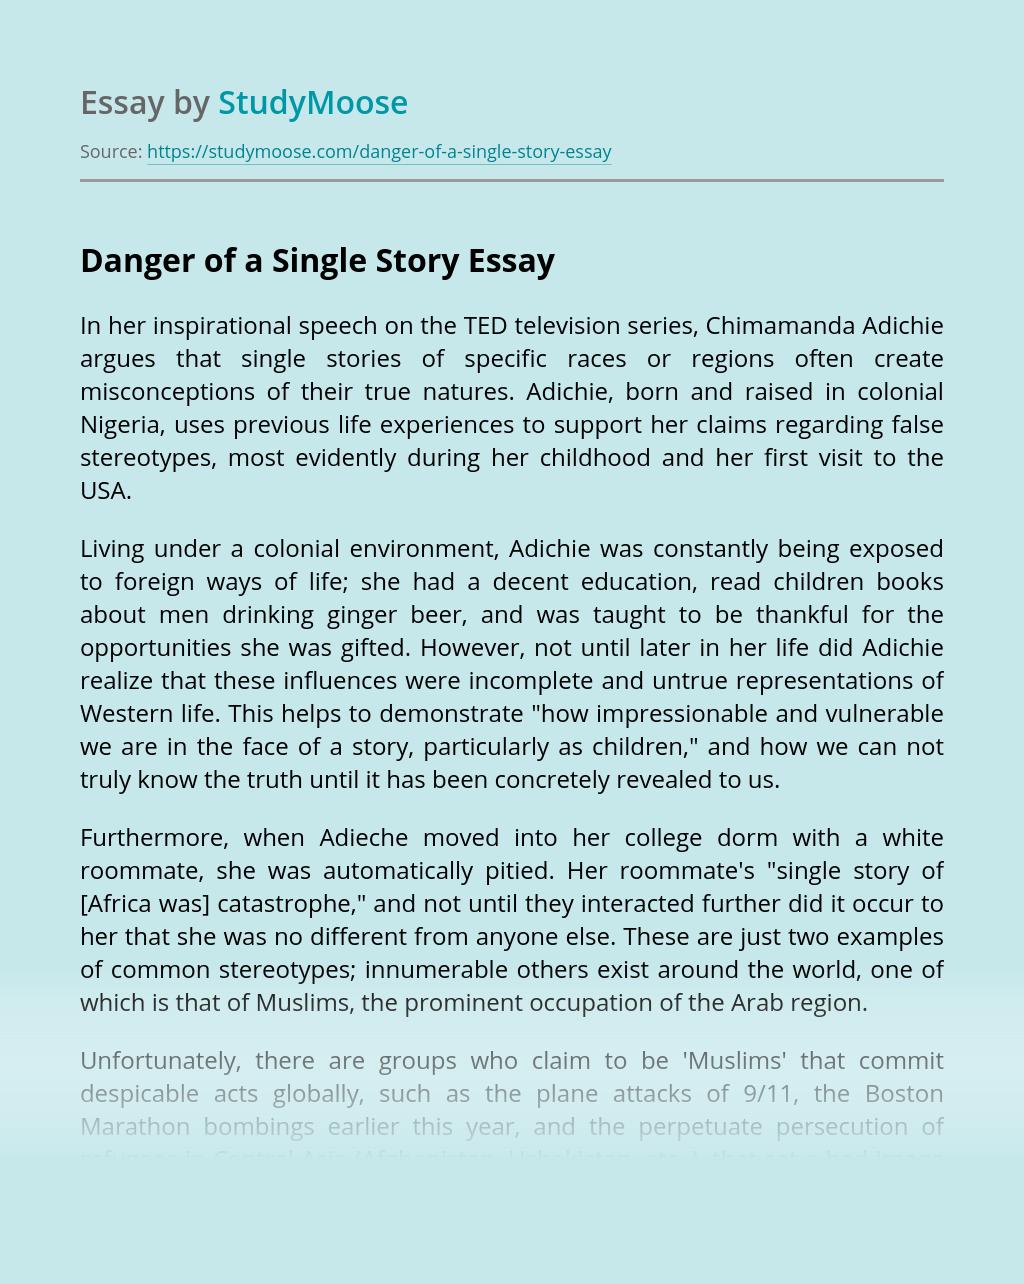 Danger of a Single Story